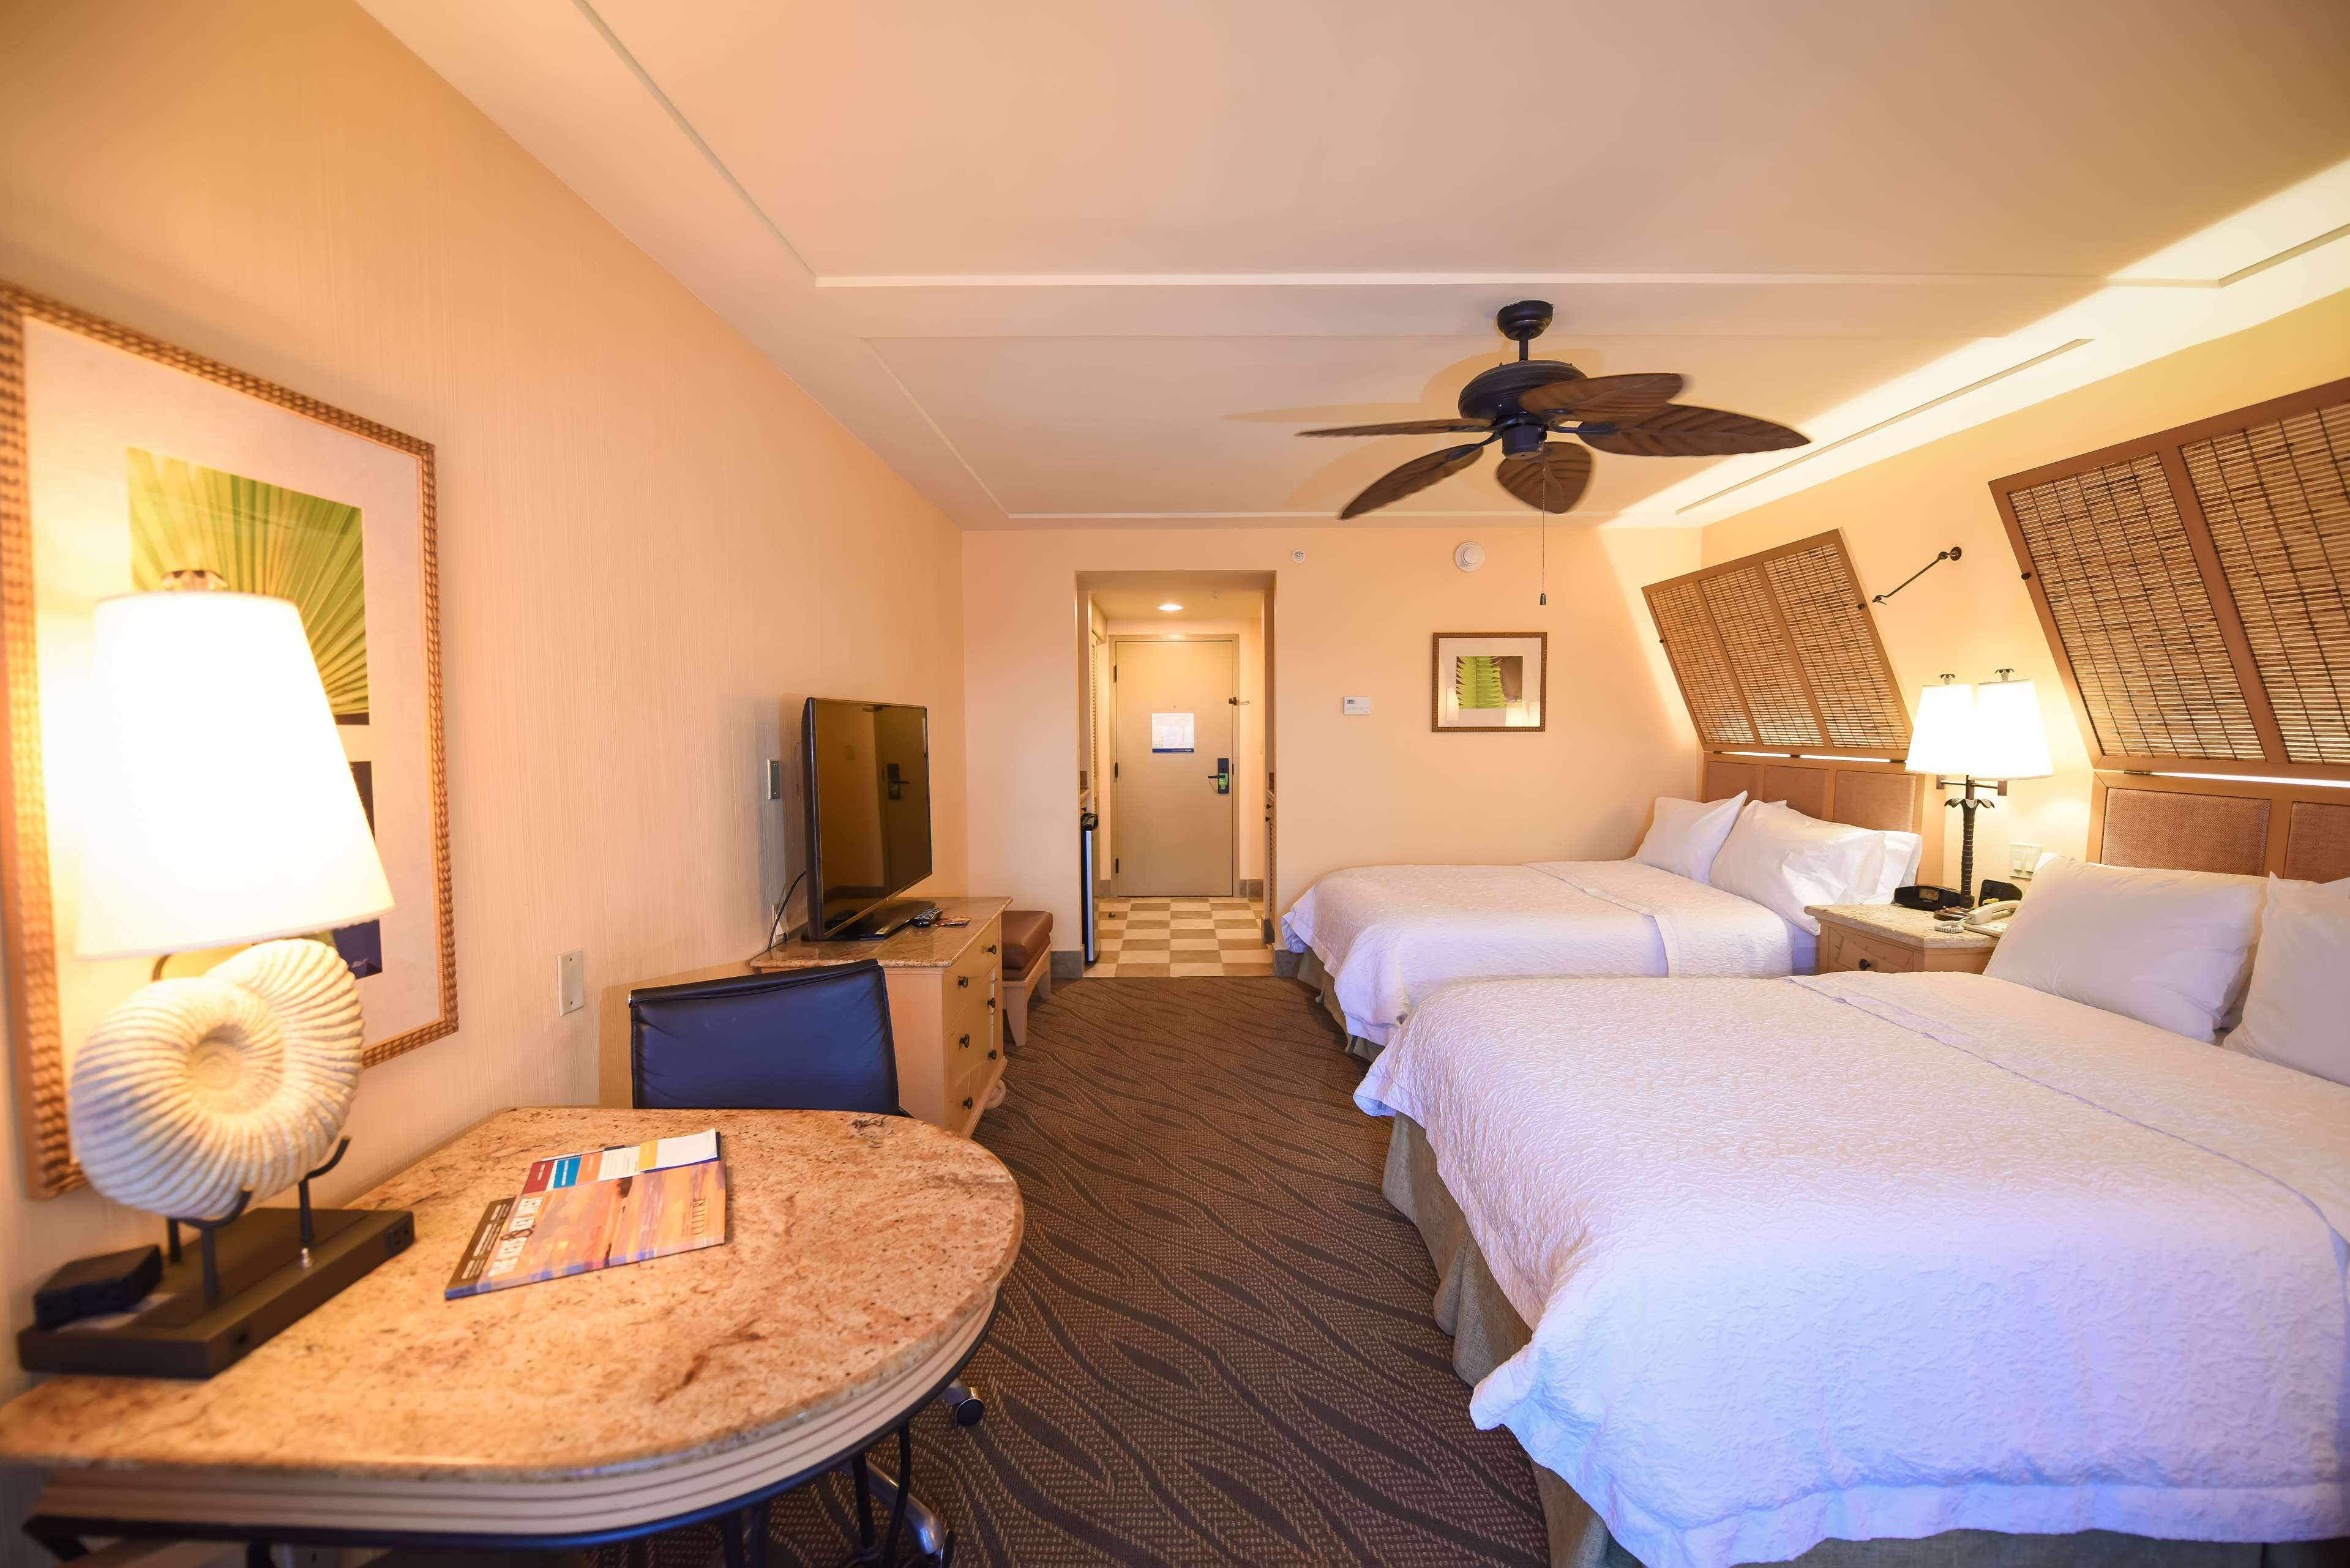 Hampton Inn Key Largo, FL image 23